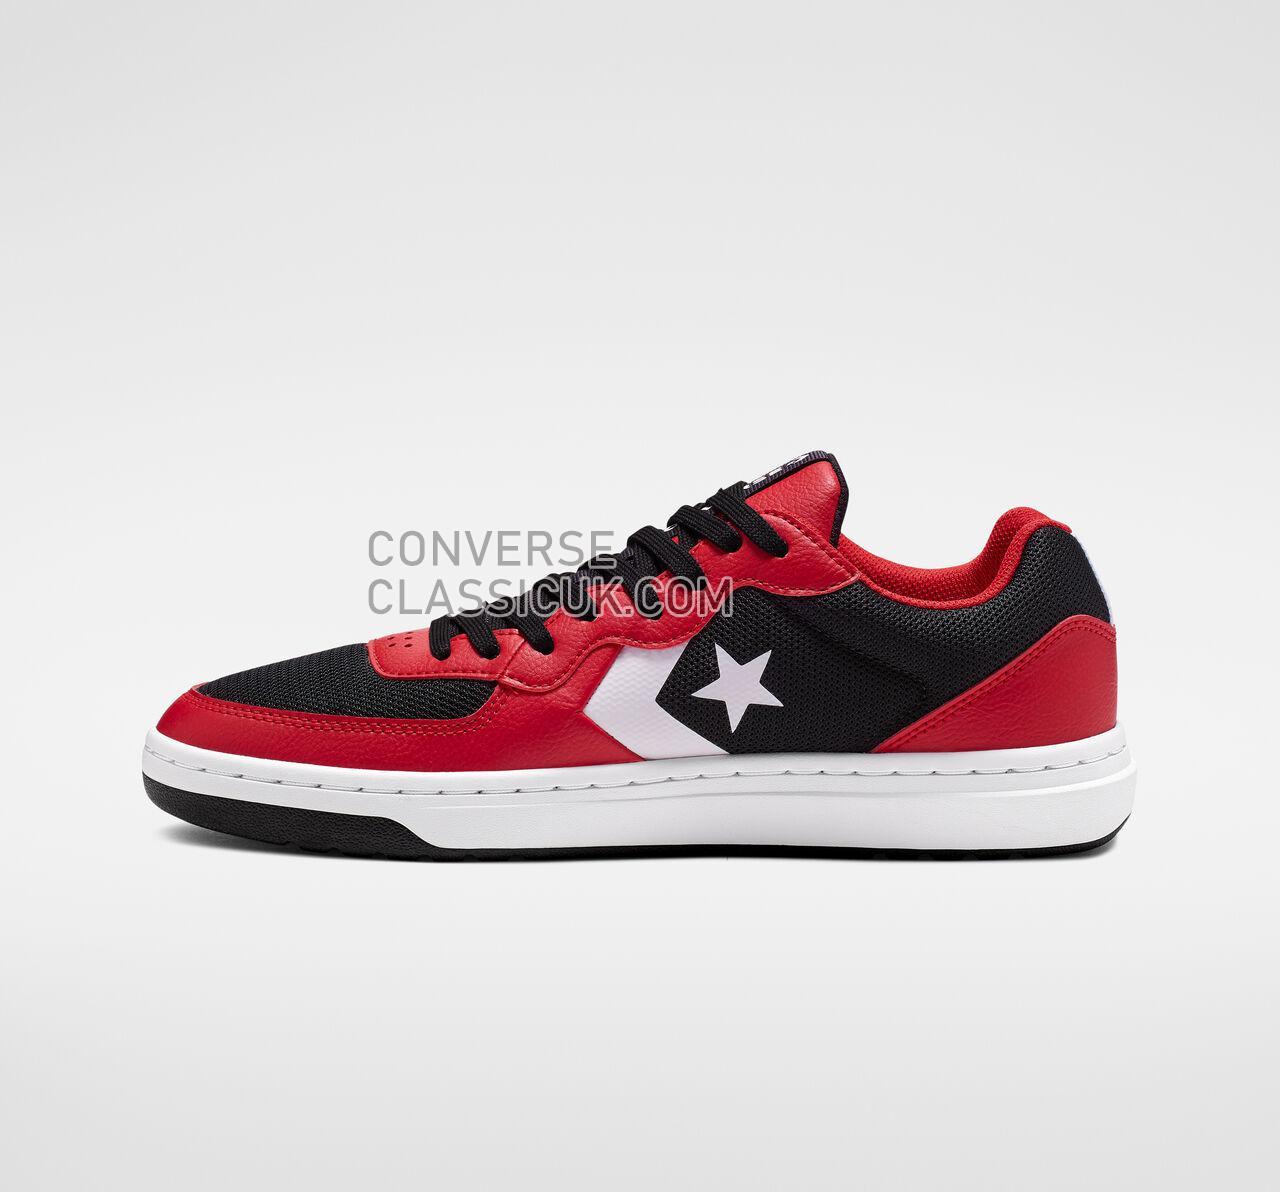 Converse Rival Low Top Mens Womens Unisex 164895C Black/Enamel Red/White Shoes